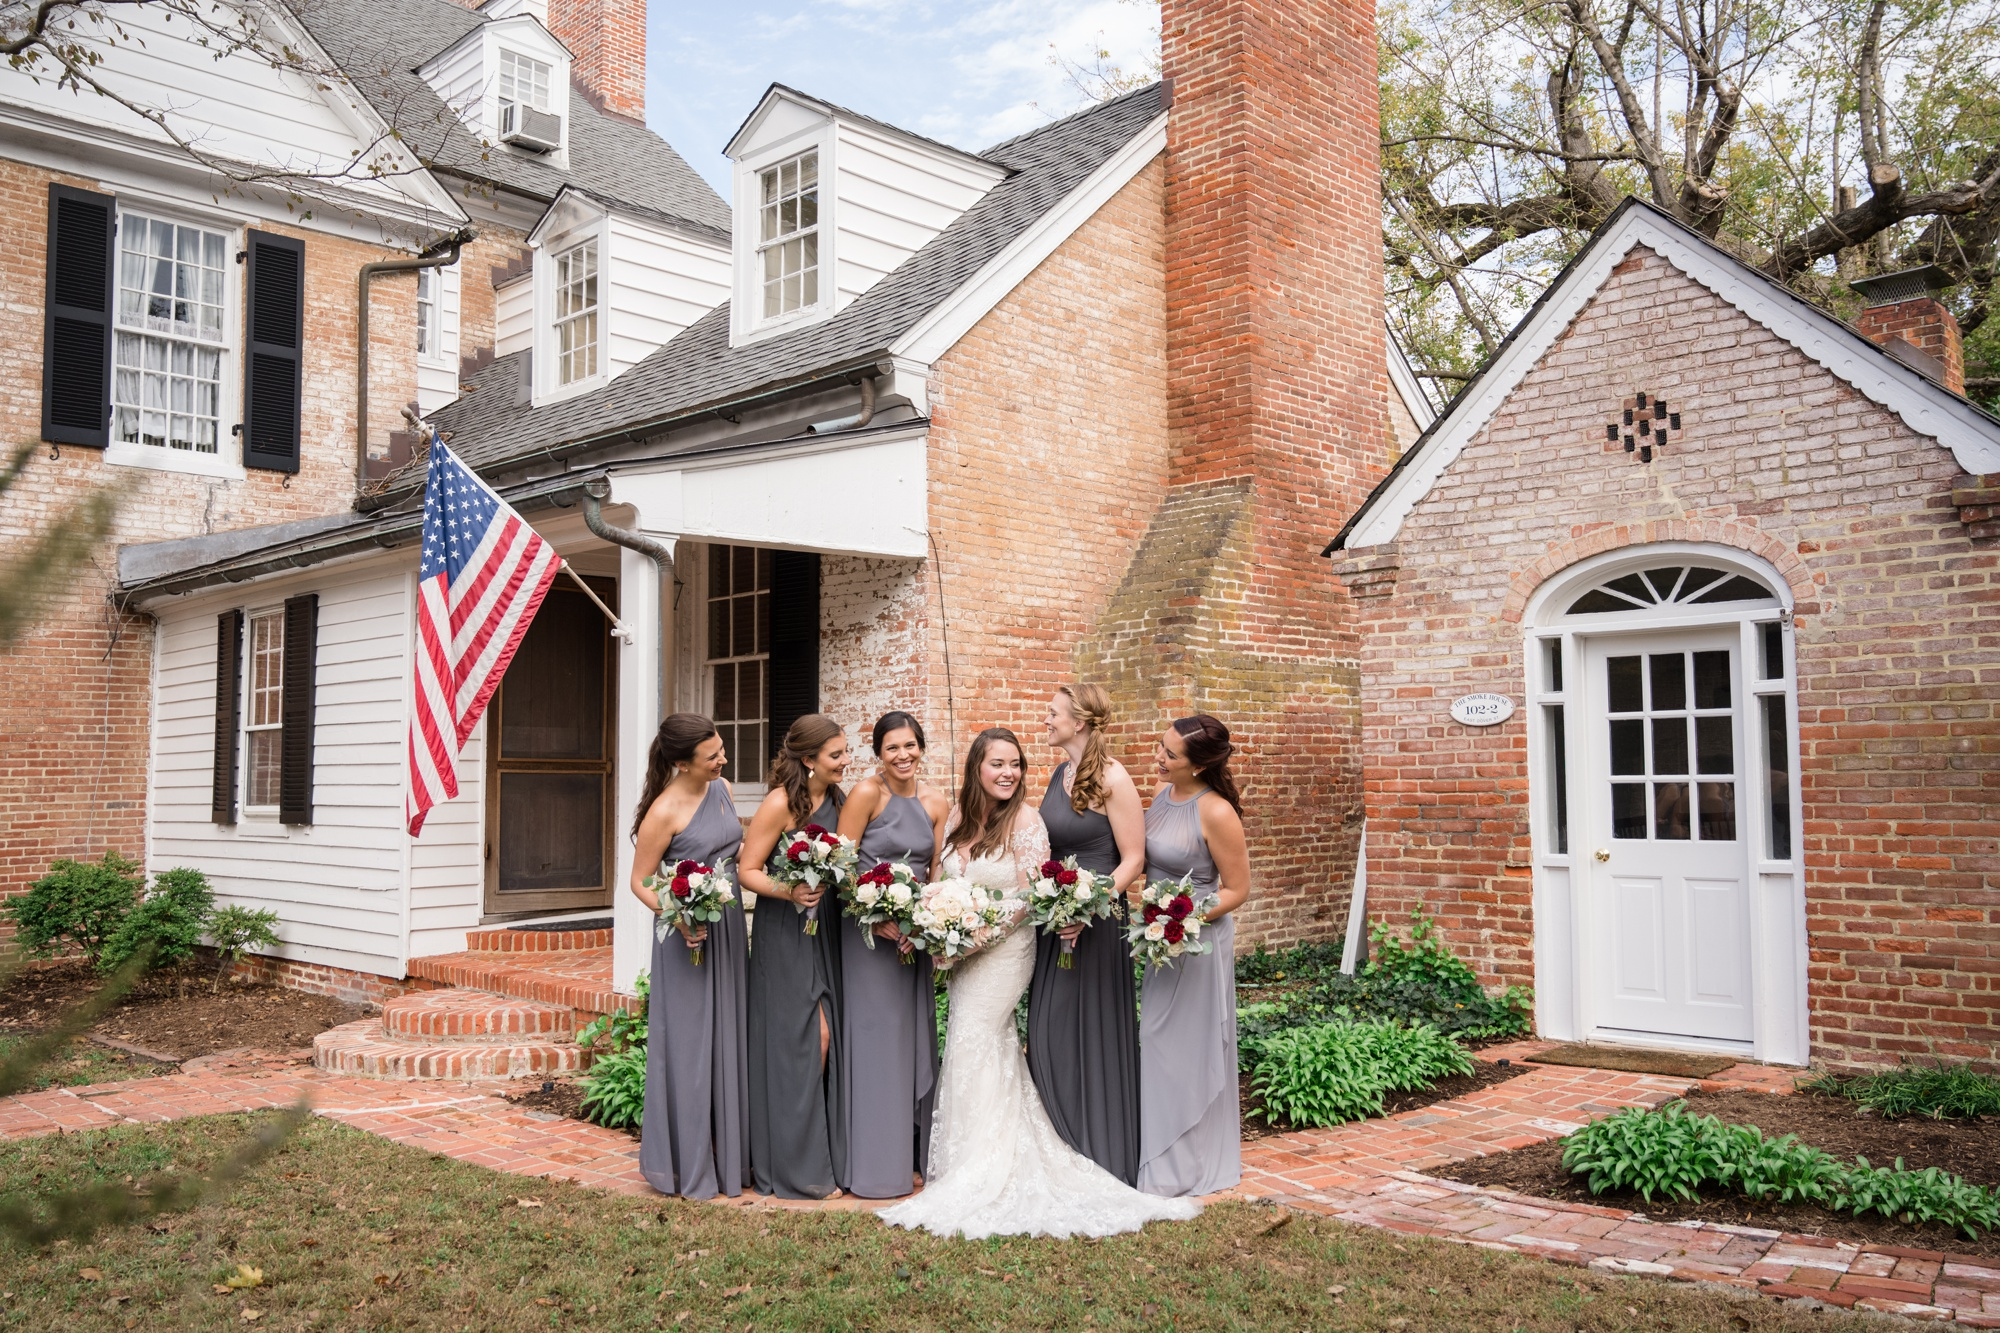 Bullet House bridesmaid photo